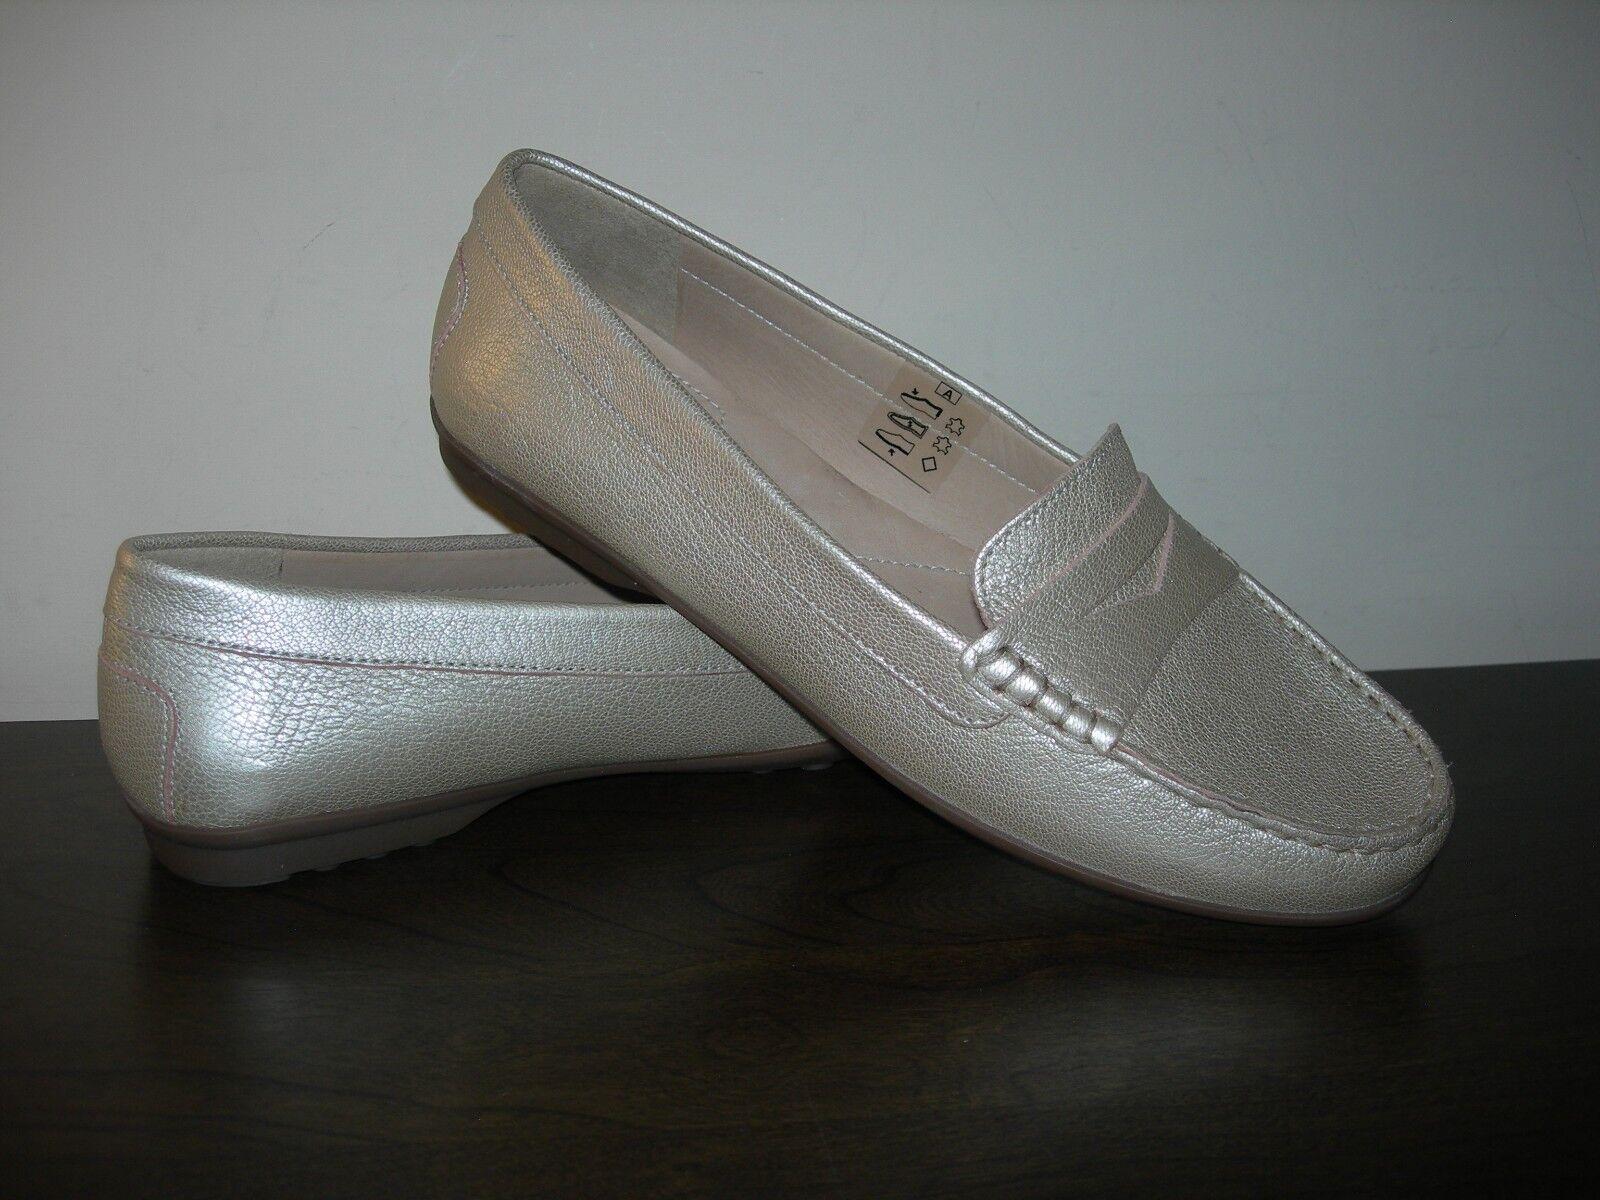 GEOX RESPIRA WOMEN'S Schuhe (II) SLIP ON CHAMPAGNE GOLDEN LEATHER EU 41 / UK 7.5